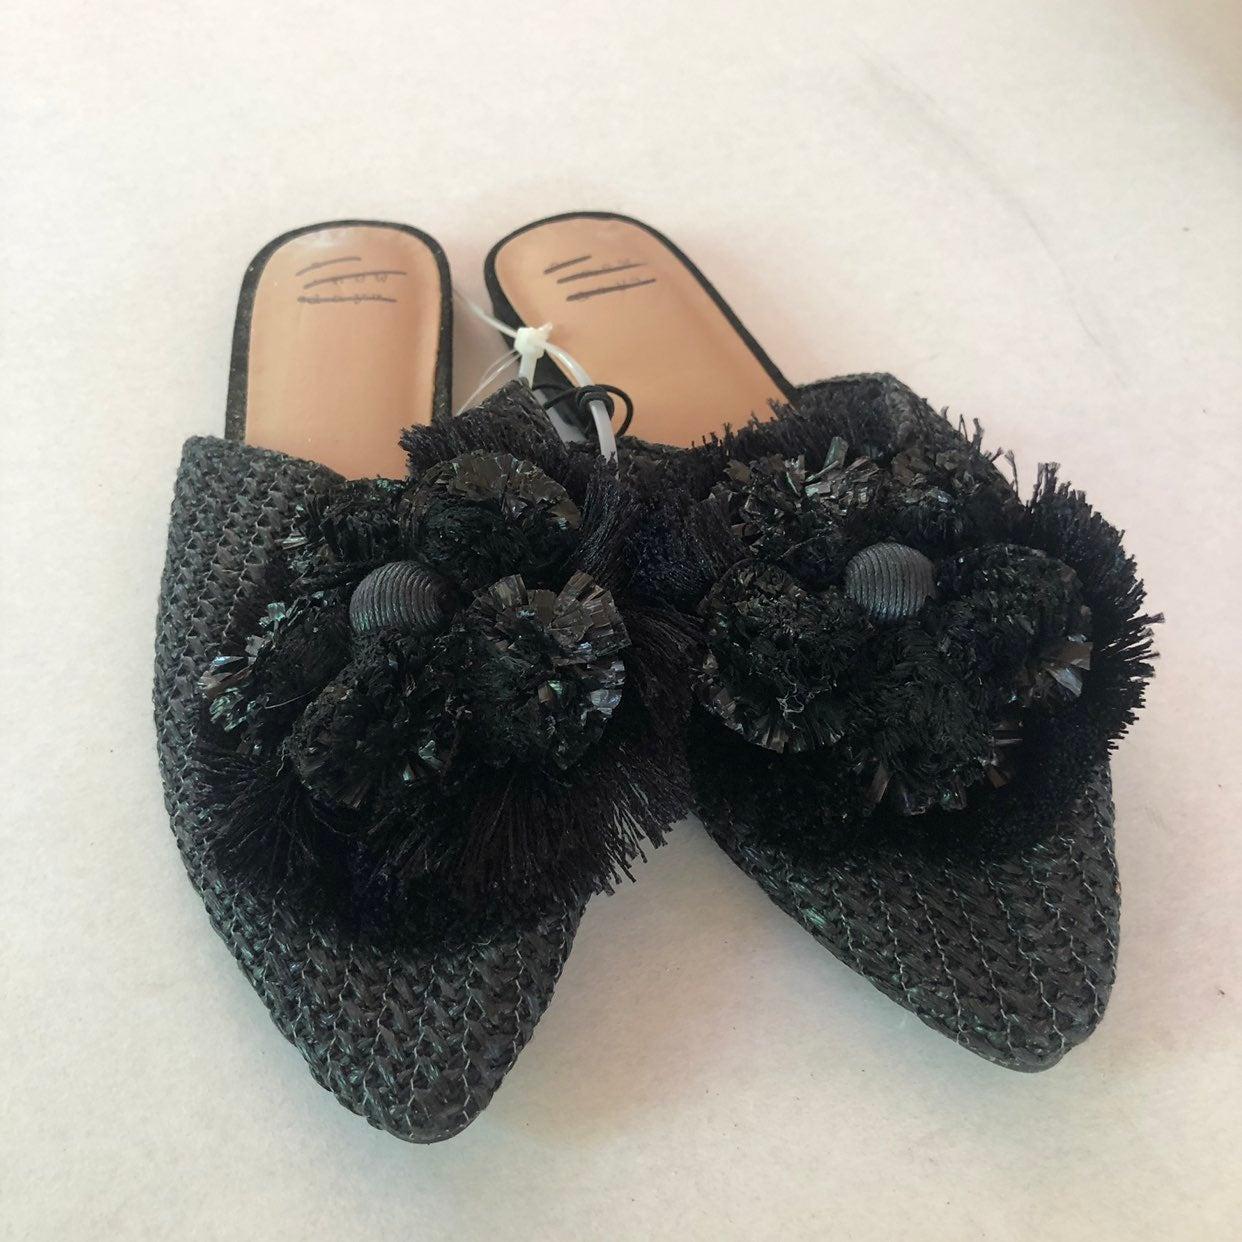 New womens shoes clogs mules 7 black flo